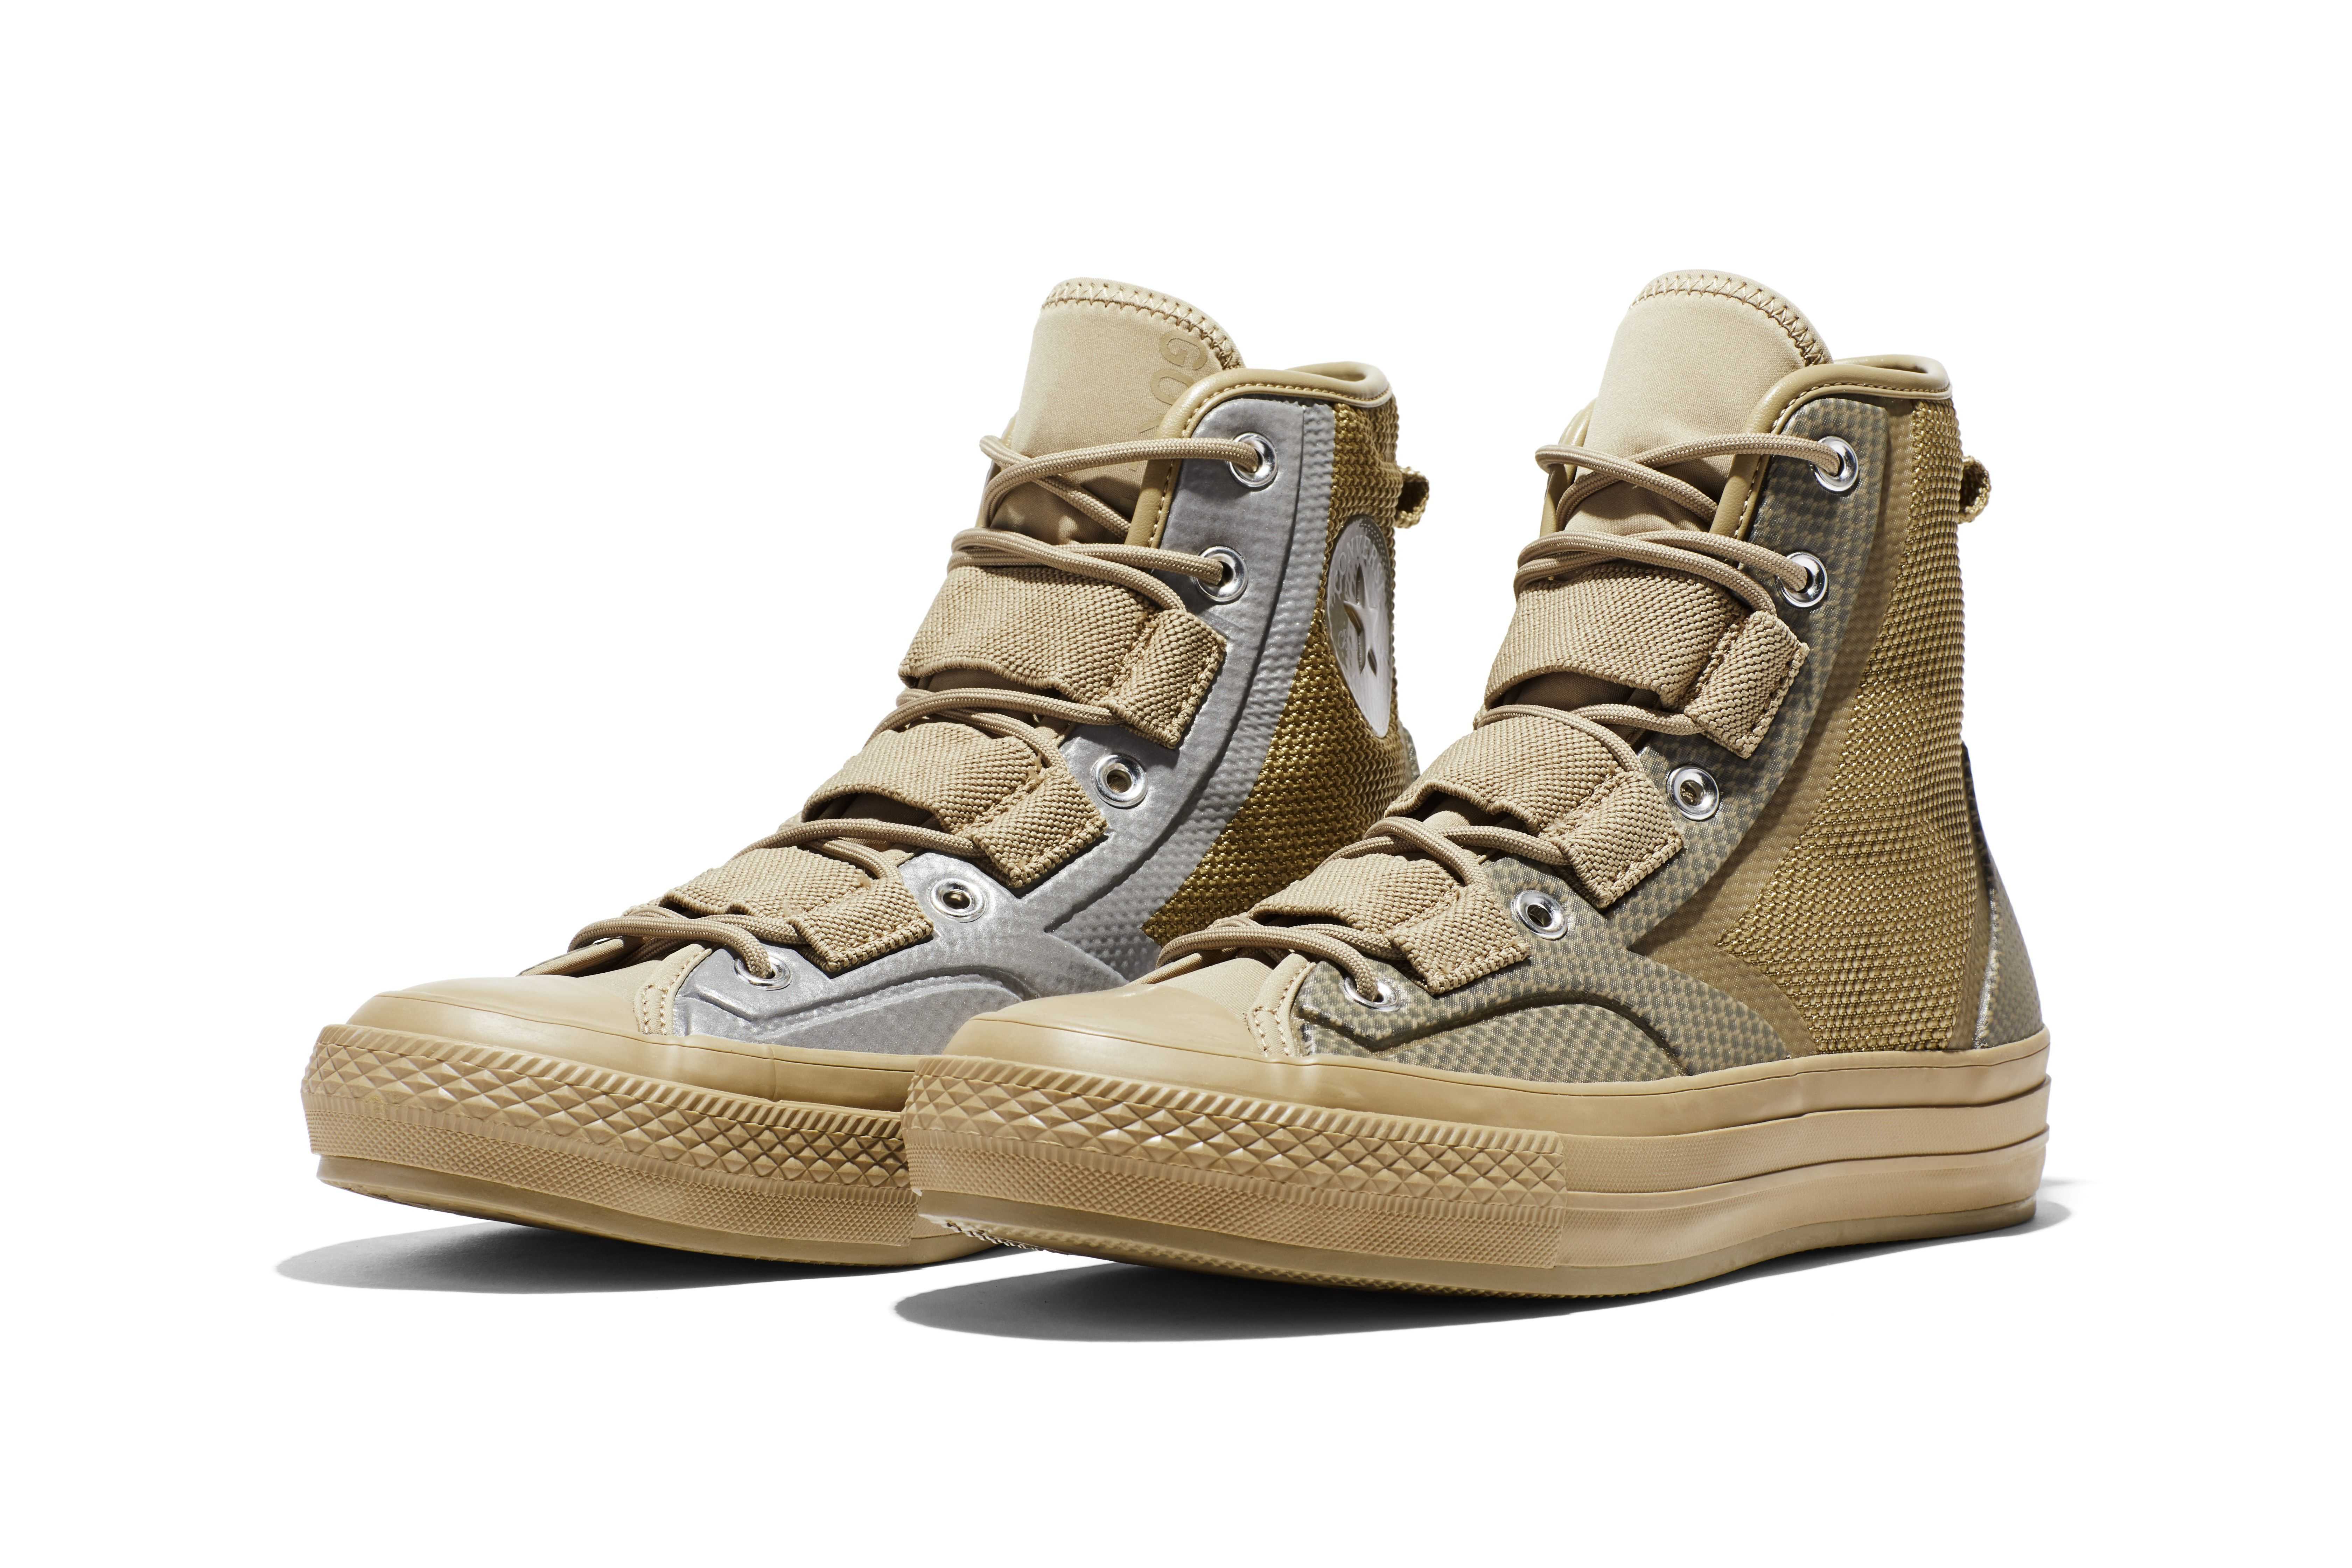 dc9f1c704764 Converse Chuck 70 Utility Hiker | Foot Dress in 2019 | Sneaker boots ...